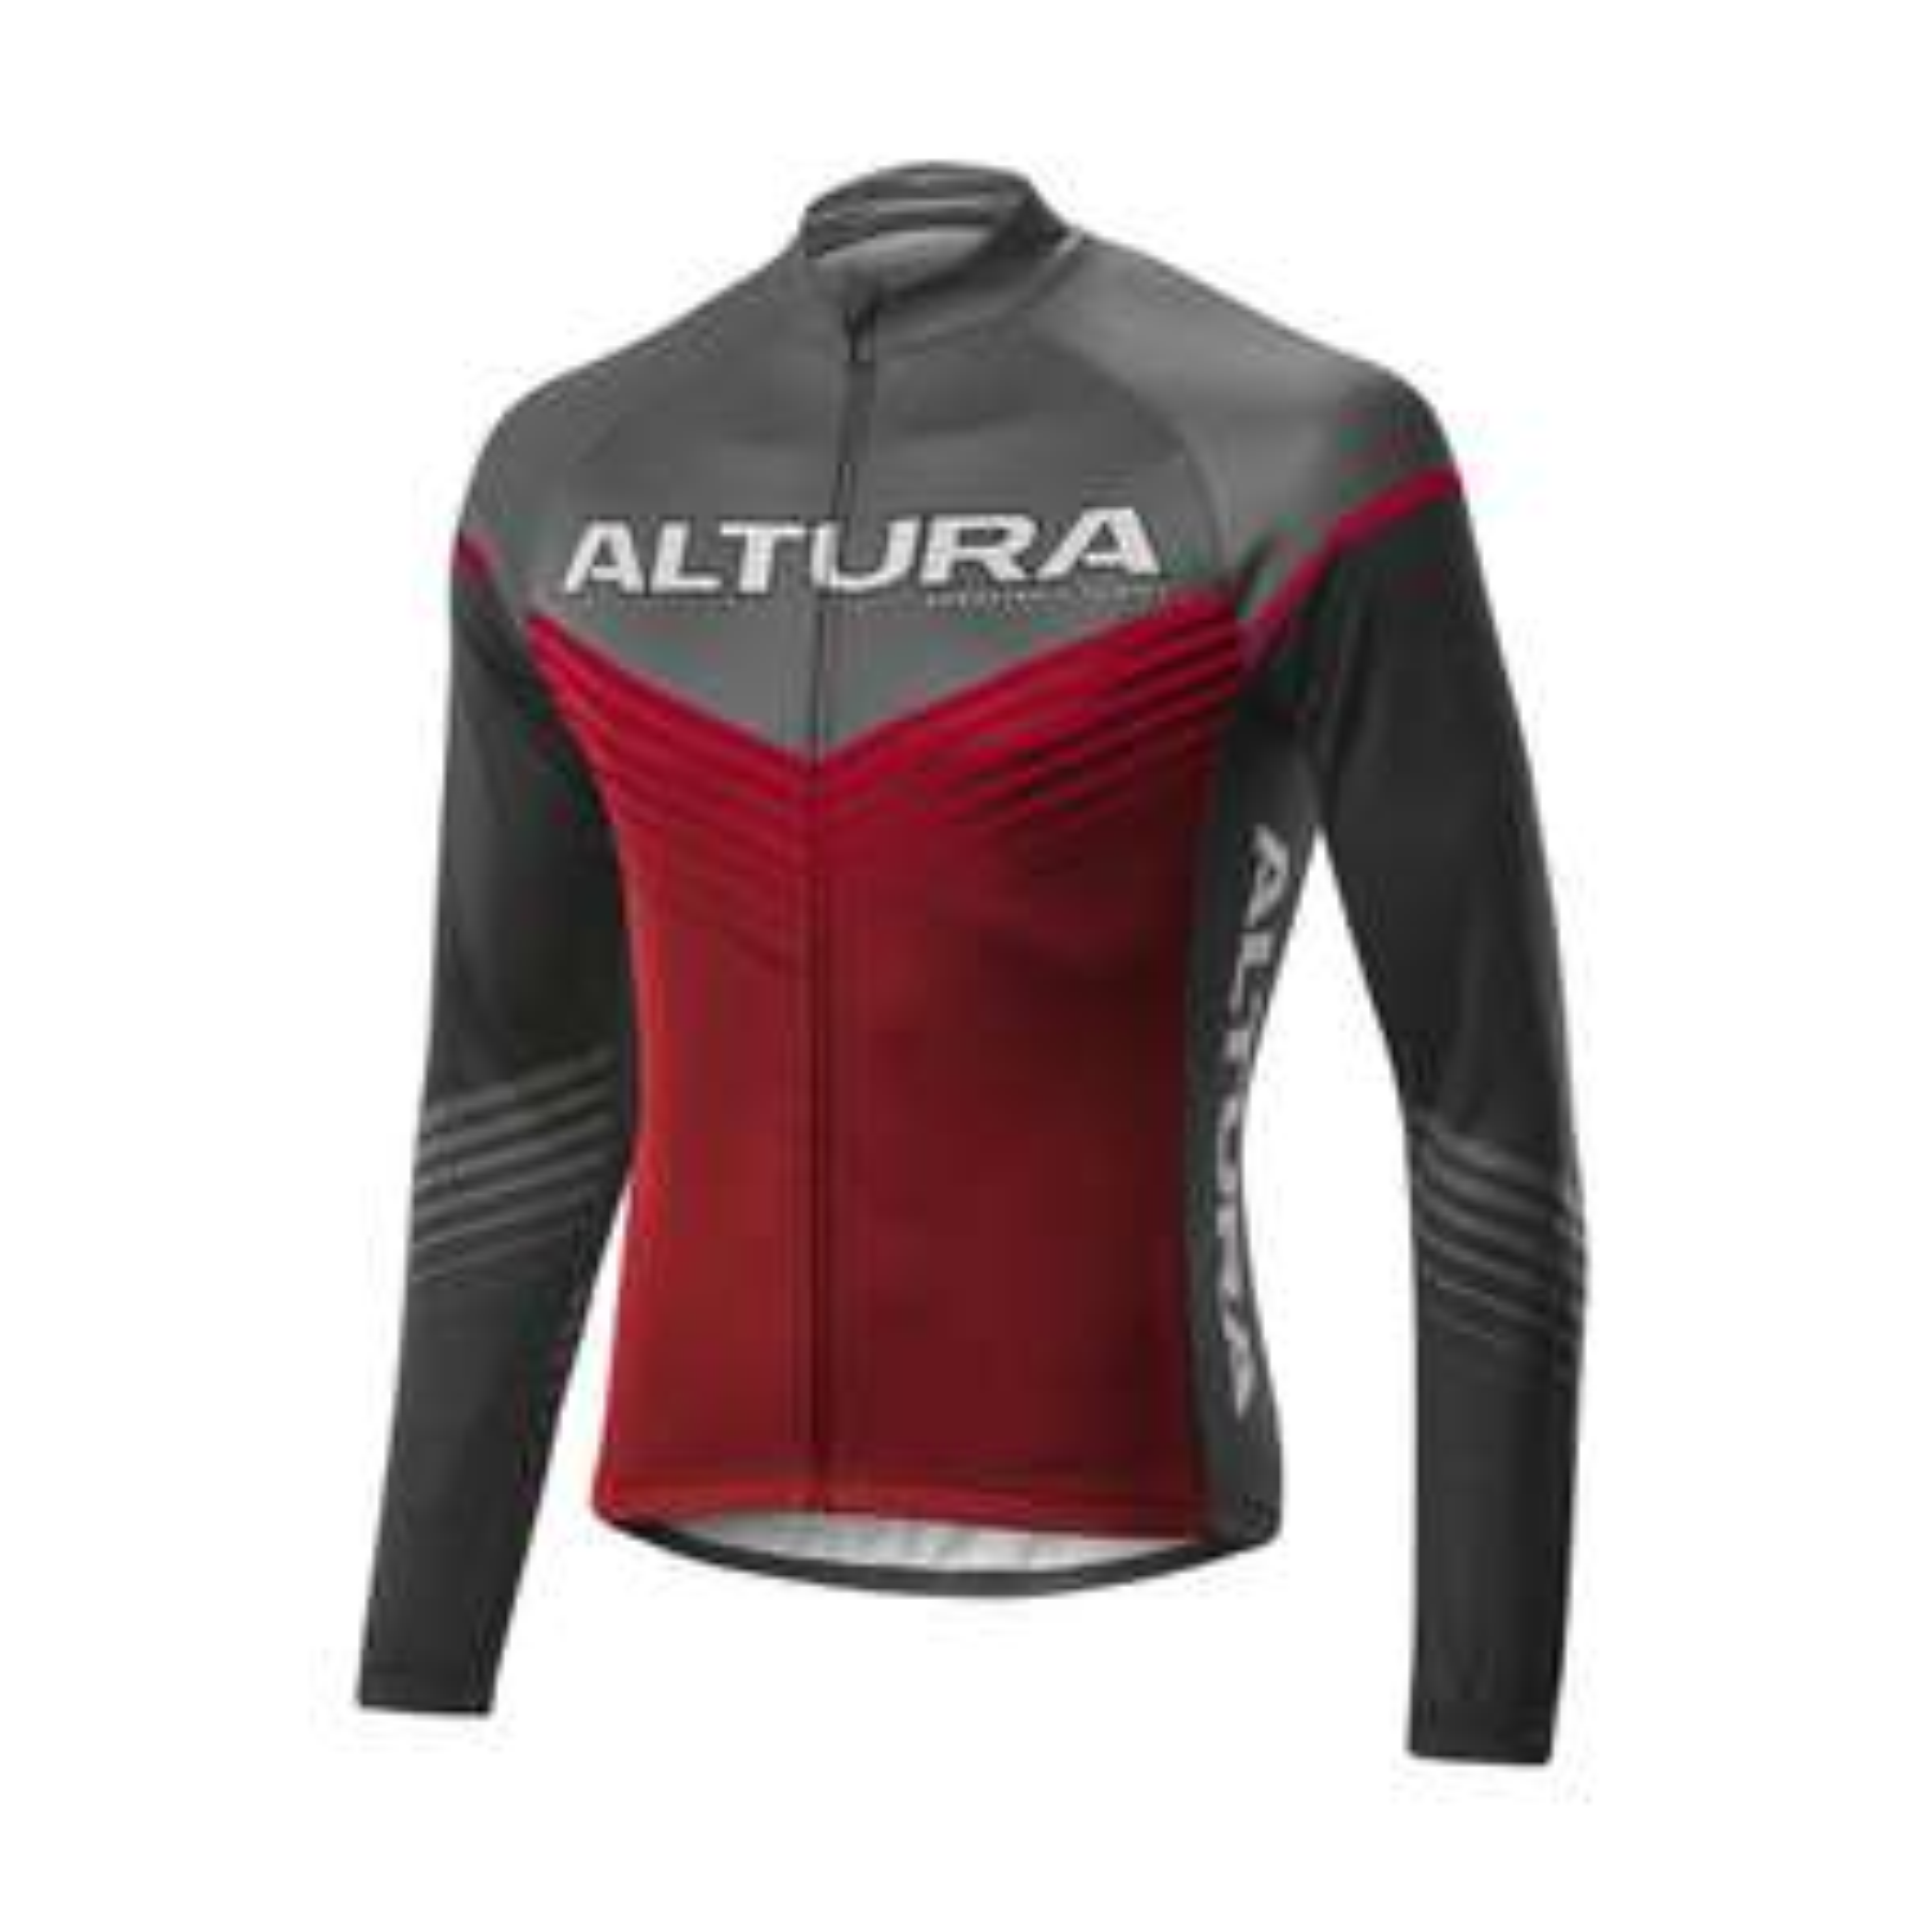 Altura Sportive Chevron Long Sleeve Jersey £19.99 @ Tweeks Cycles